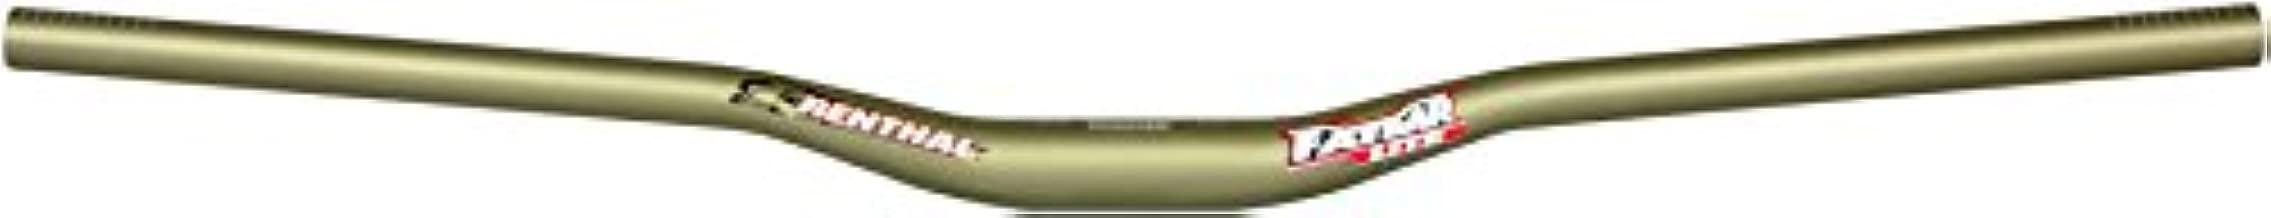 Renthal FatBar Lite V2 Handlebar: 31.8mm, 20x760mm, Gold